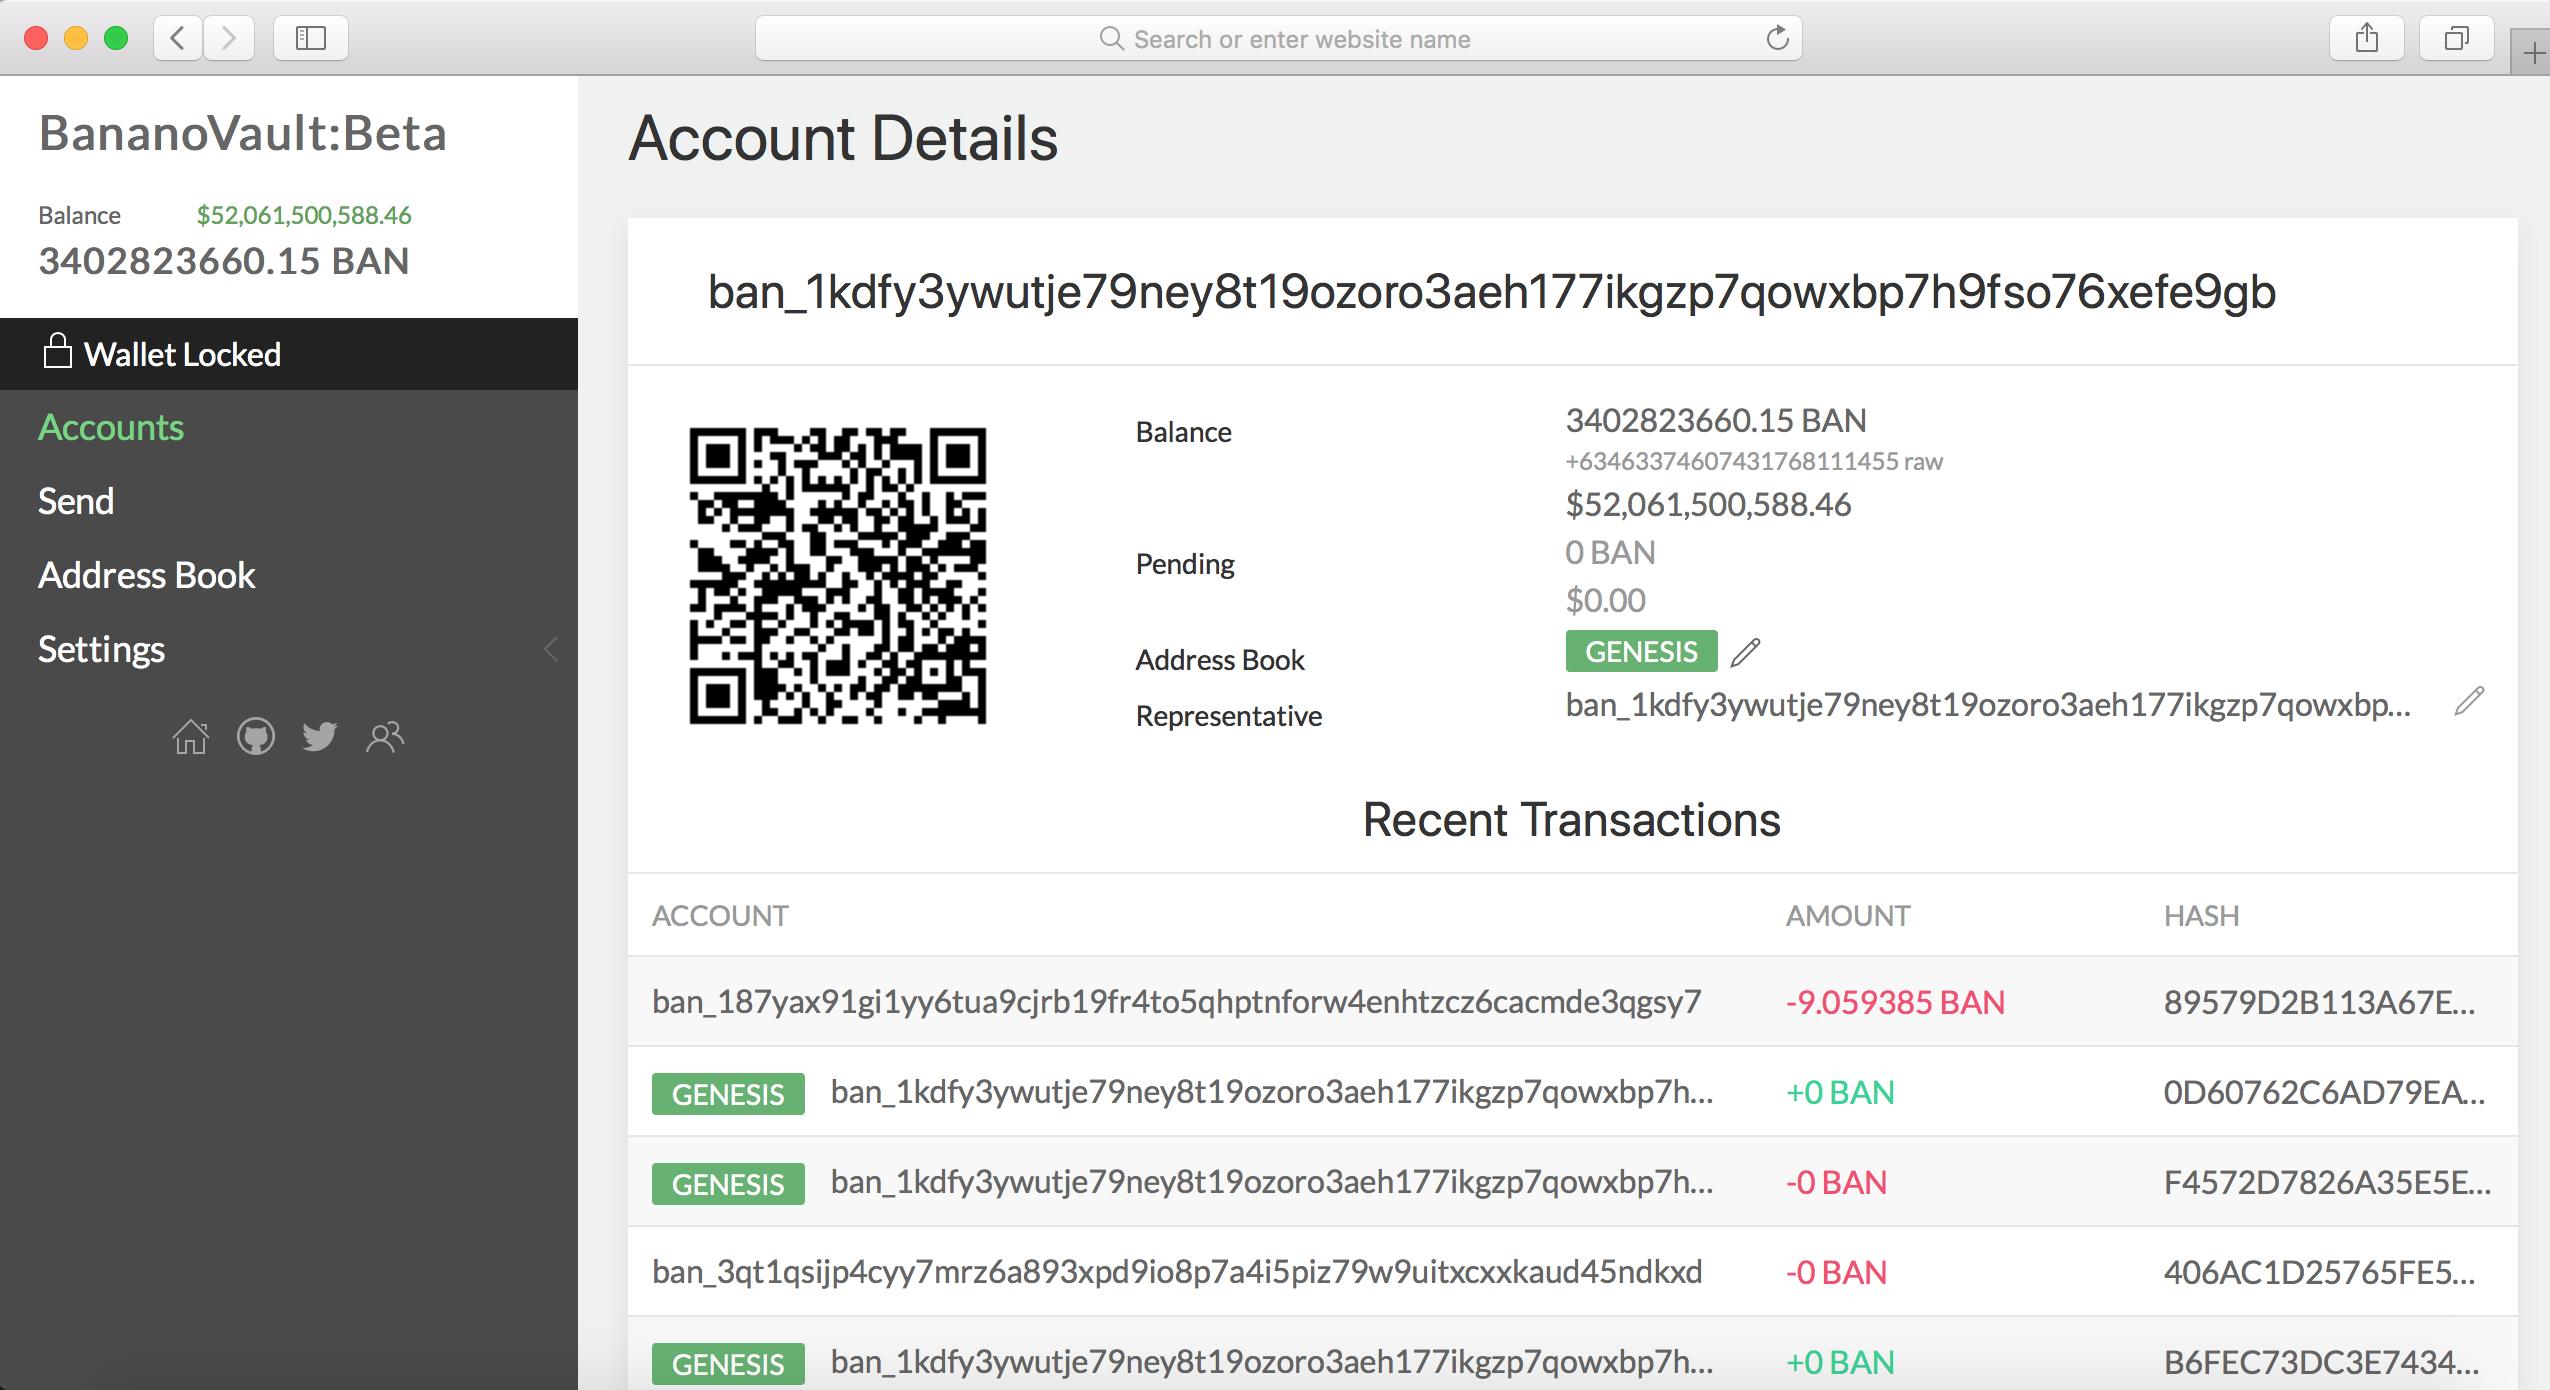 BananoVault Screenshot